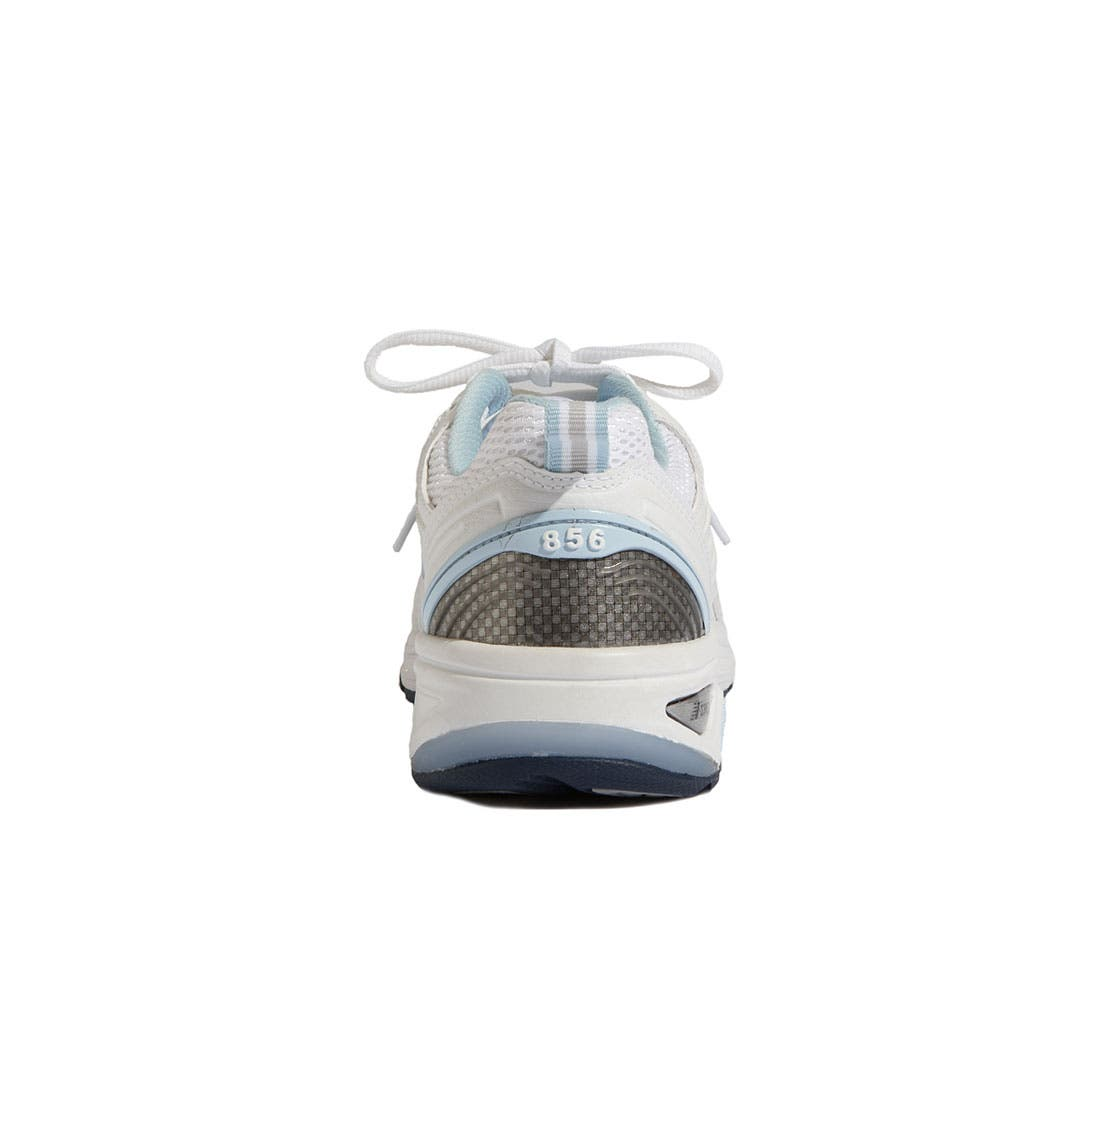 NEW BALANCE,                             '856' Training Shoe,                             Alternate thumbnail 4, color,                             110